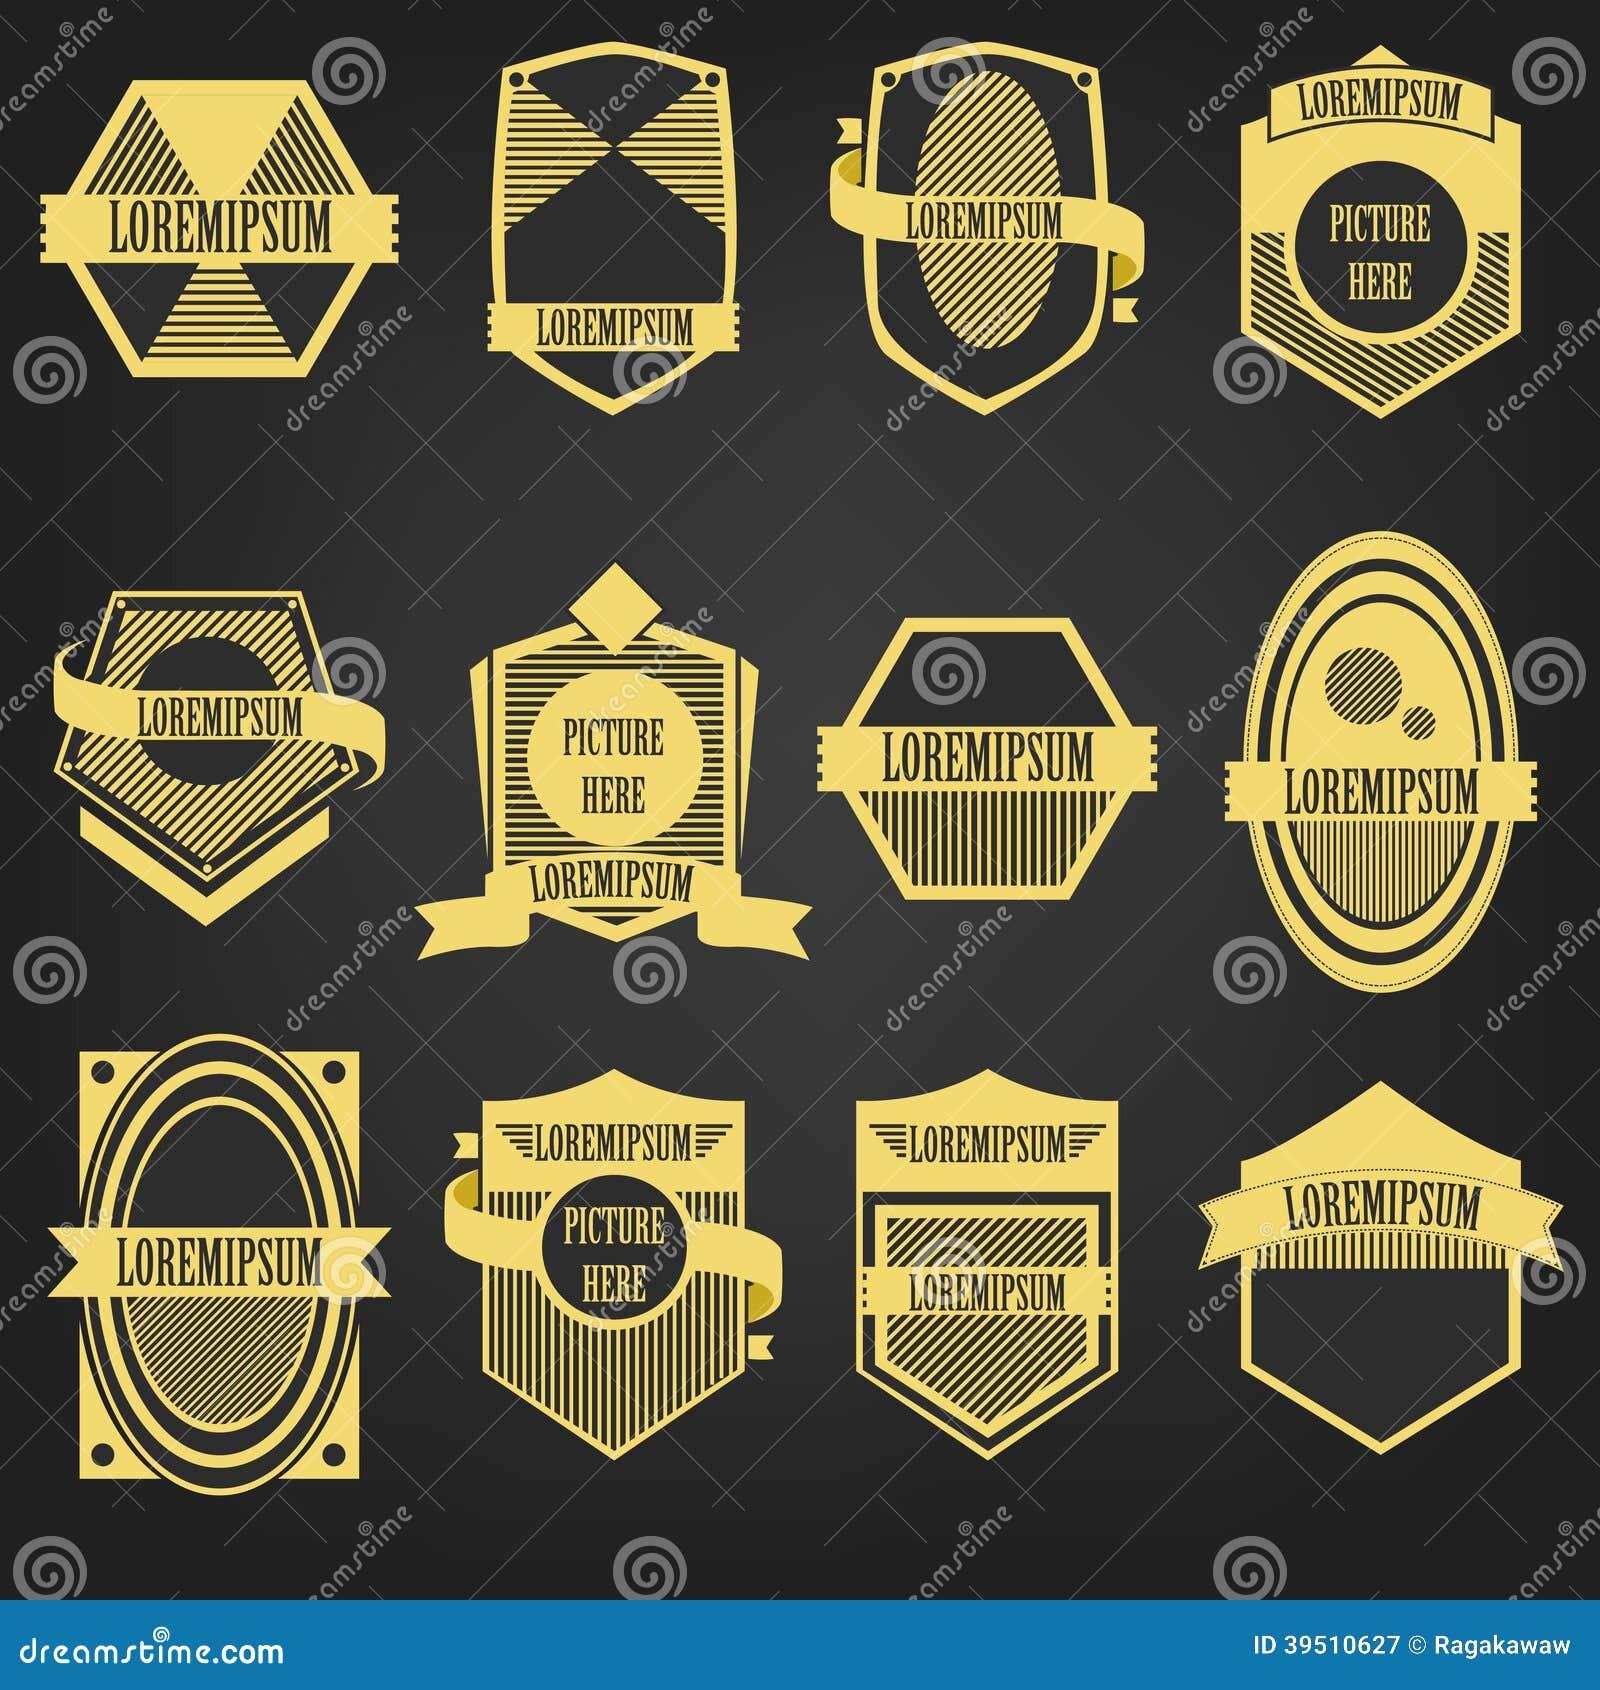 Premium Vintage Label Set